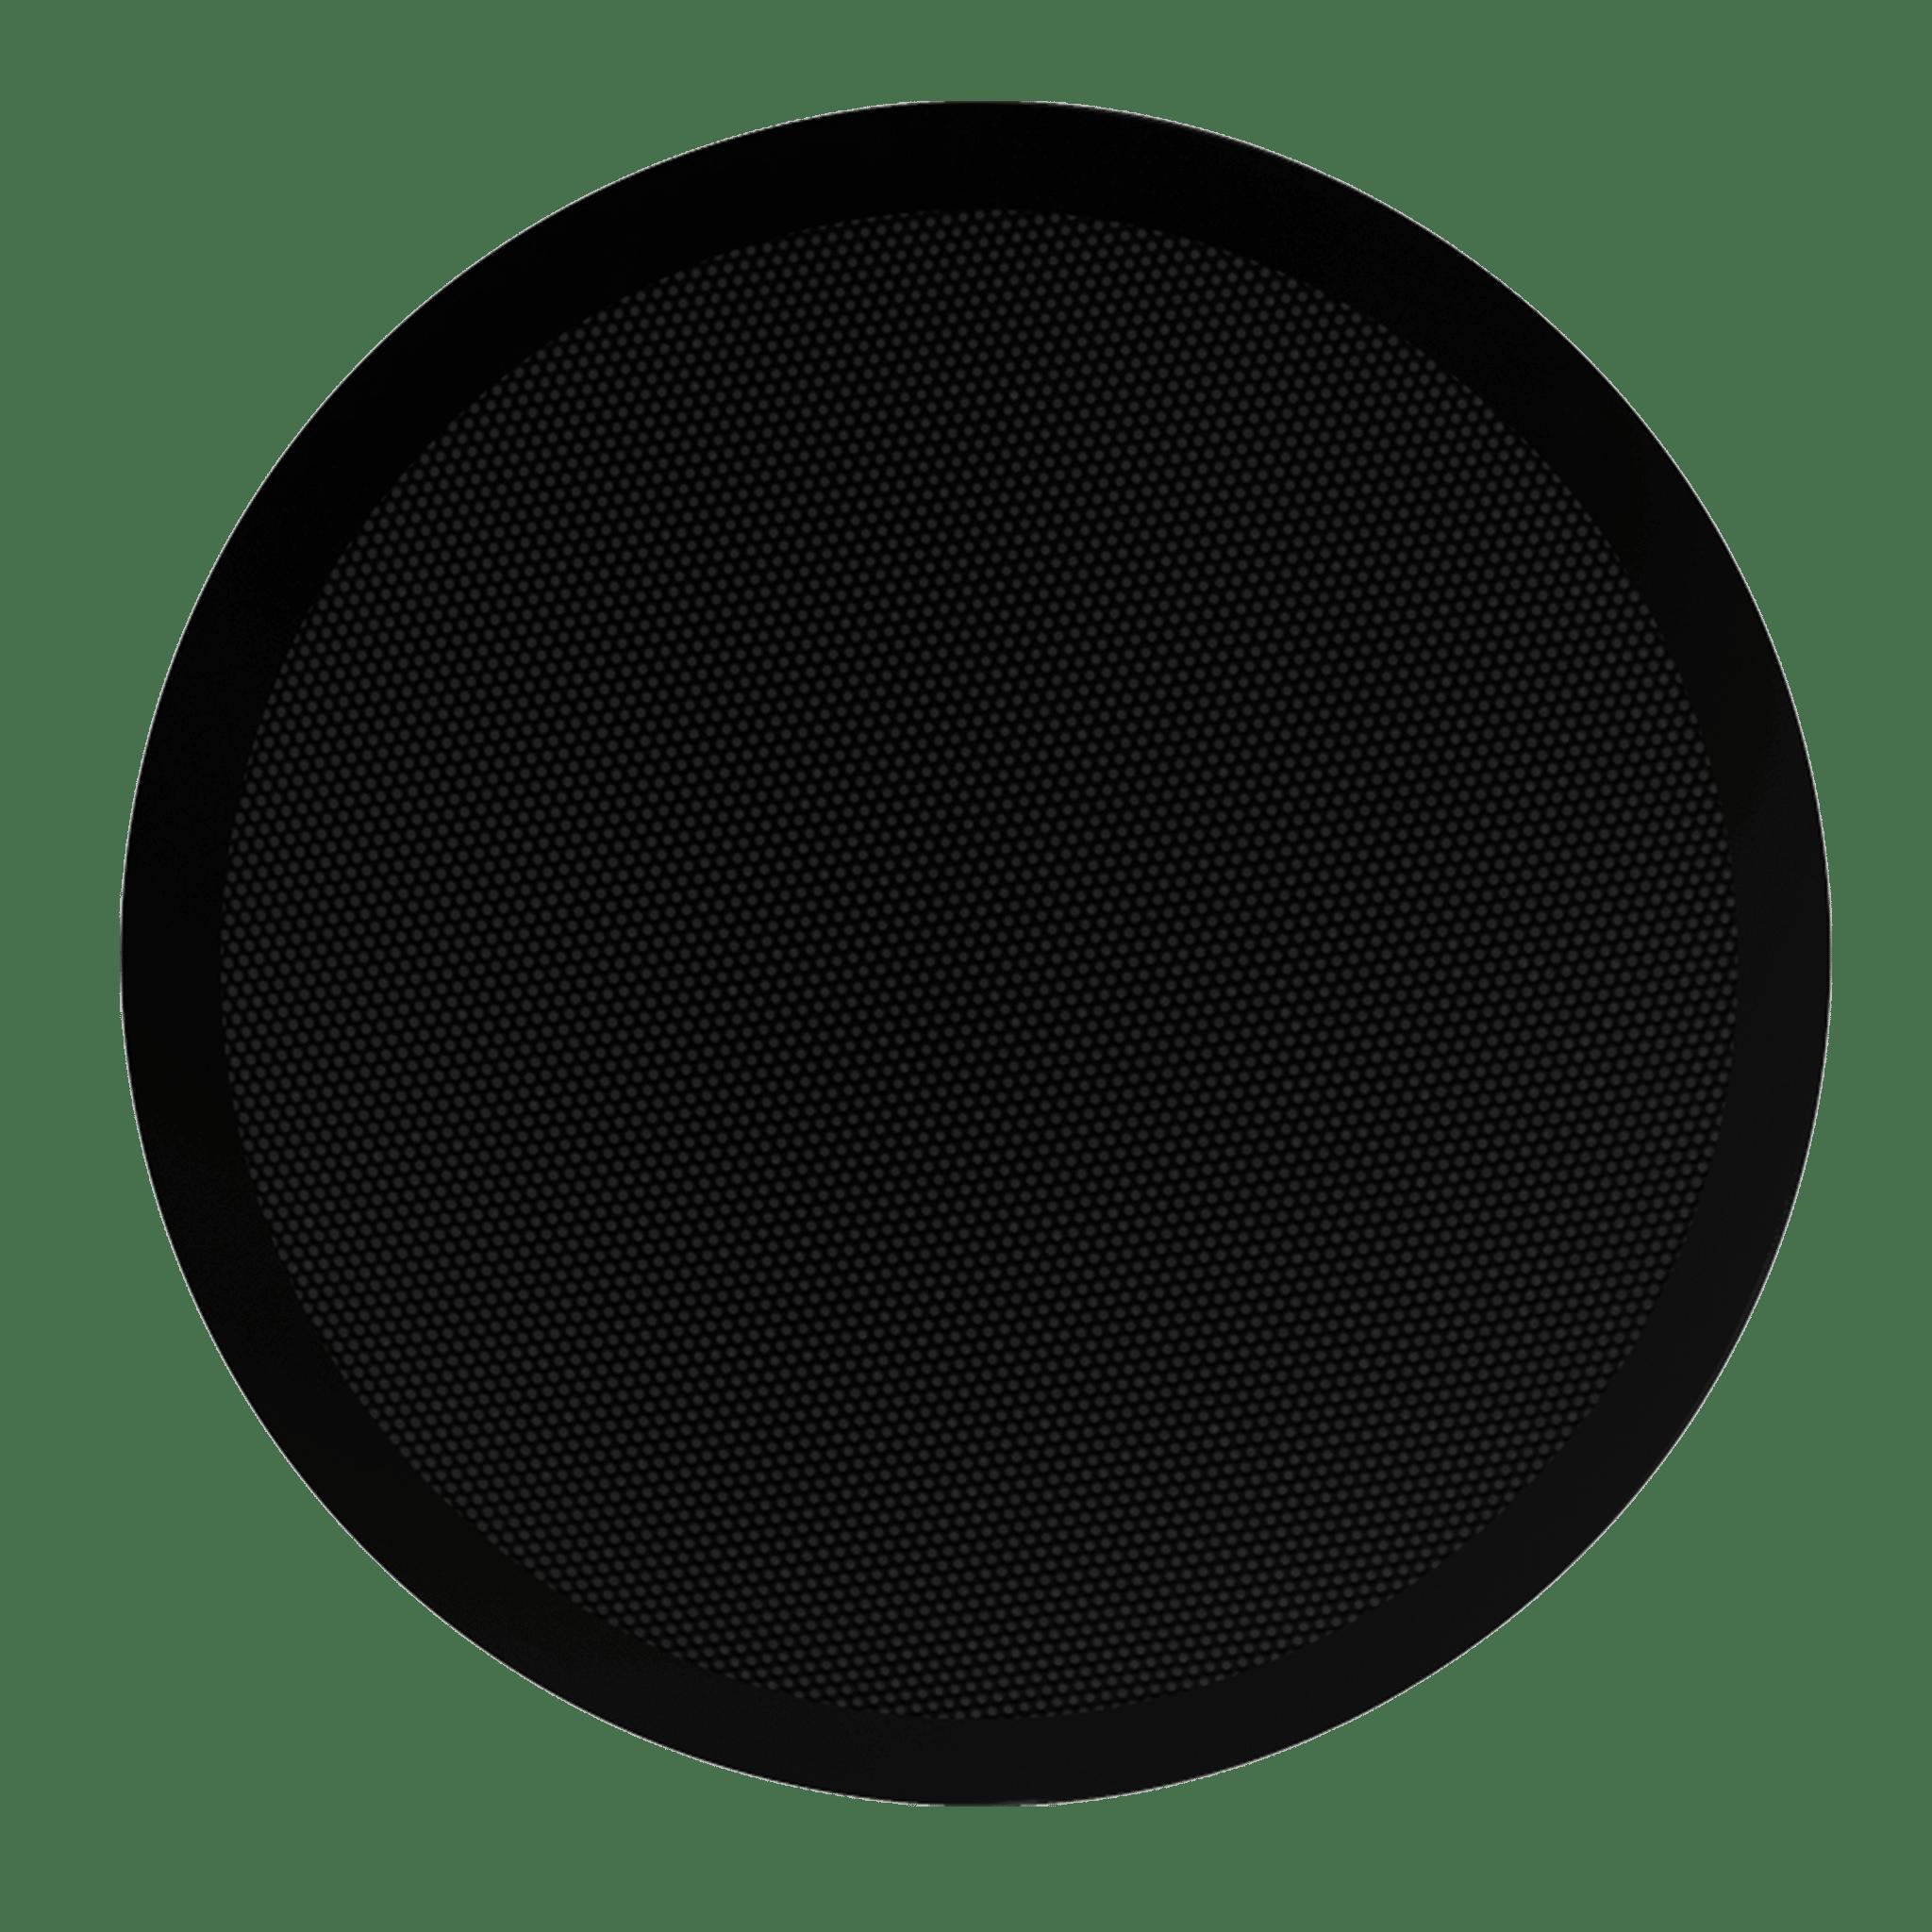 CS85/B - Black version 8 Ohm/100V